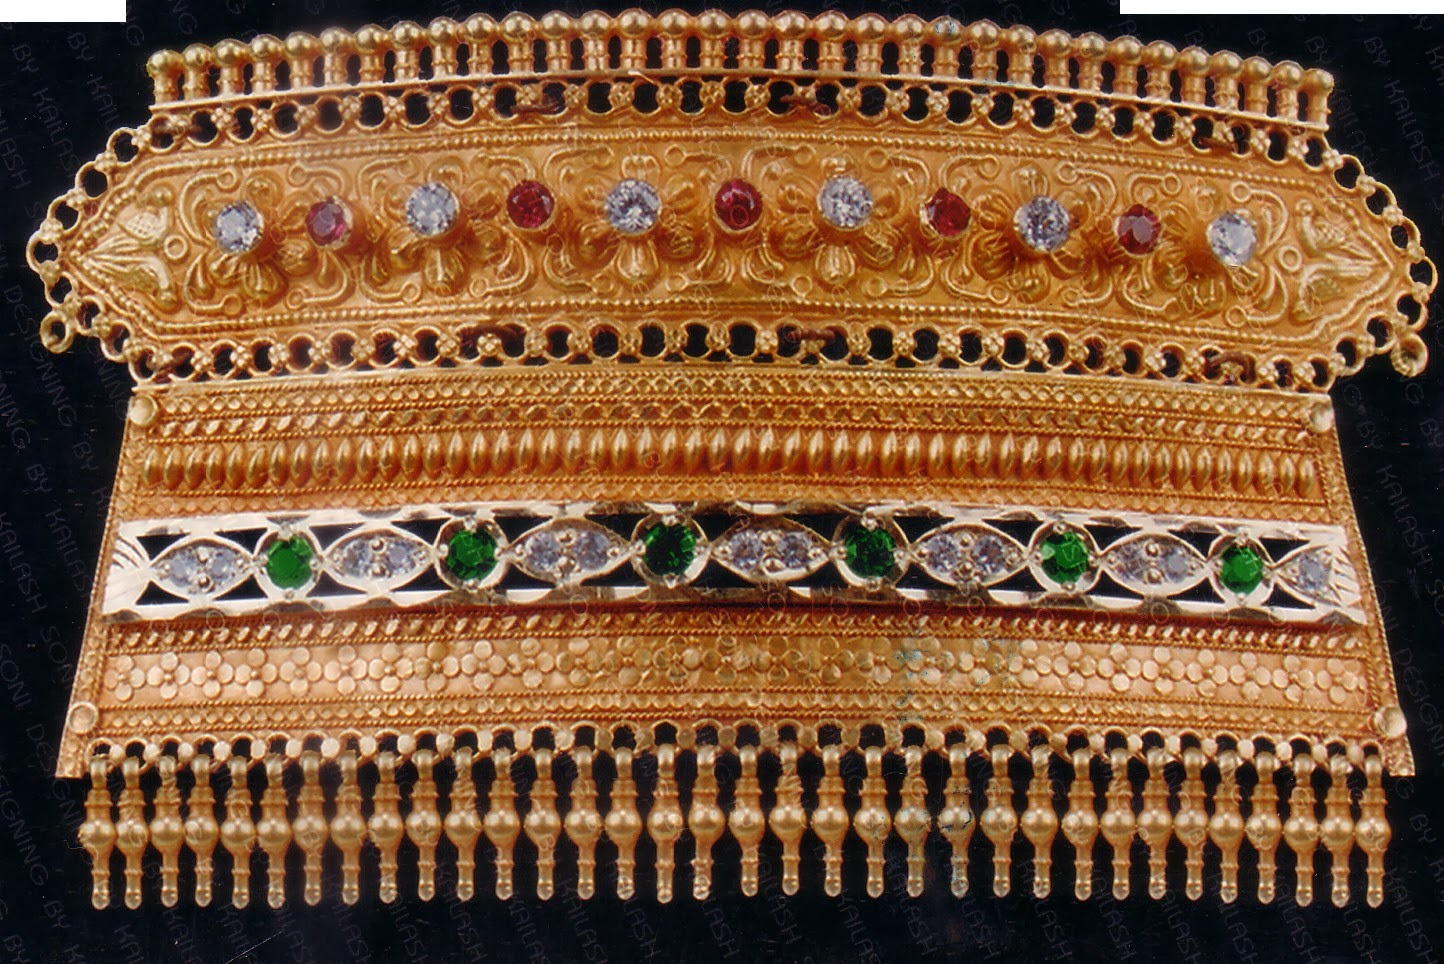 Indian Rajasthani Jewellery Baaju Band